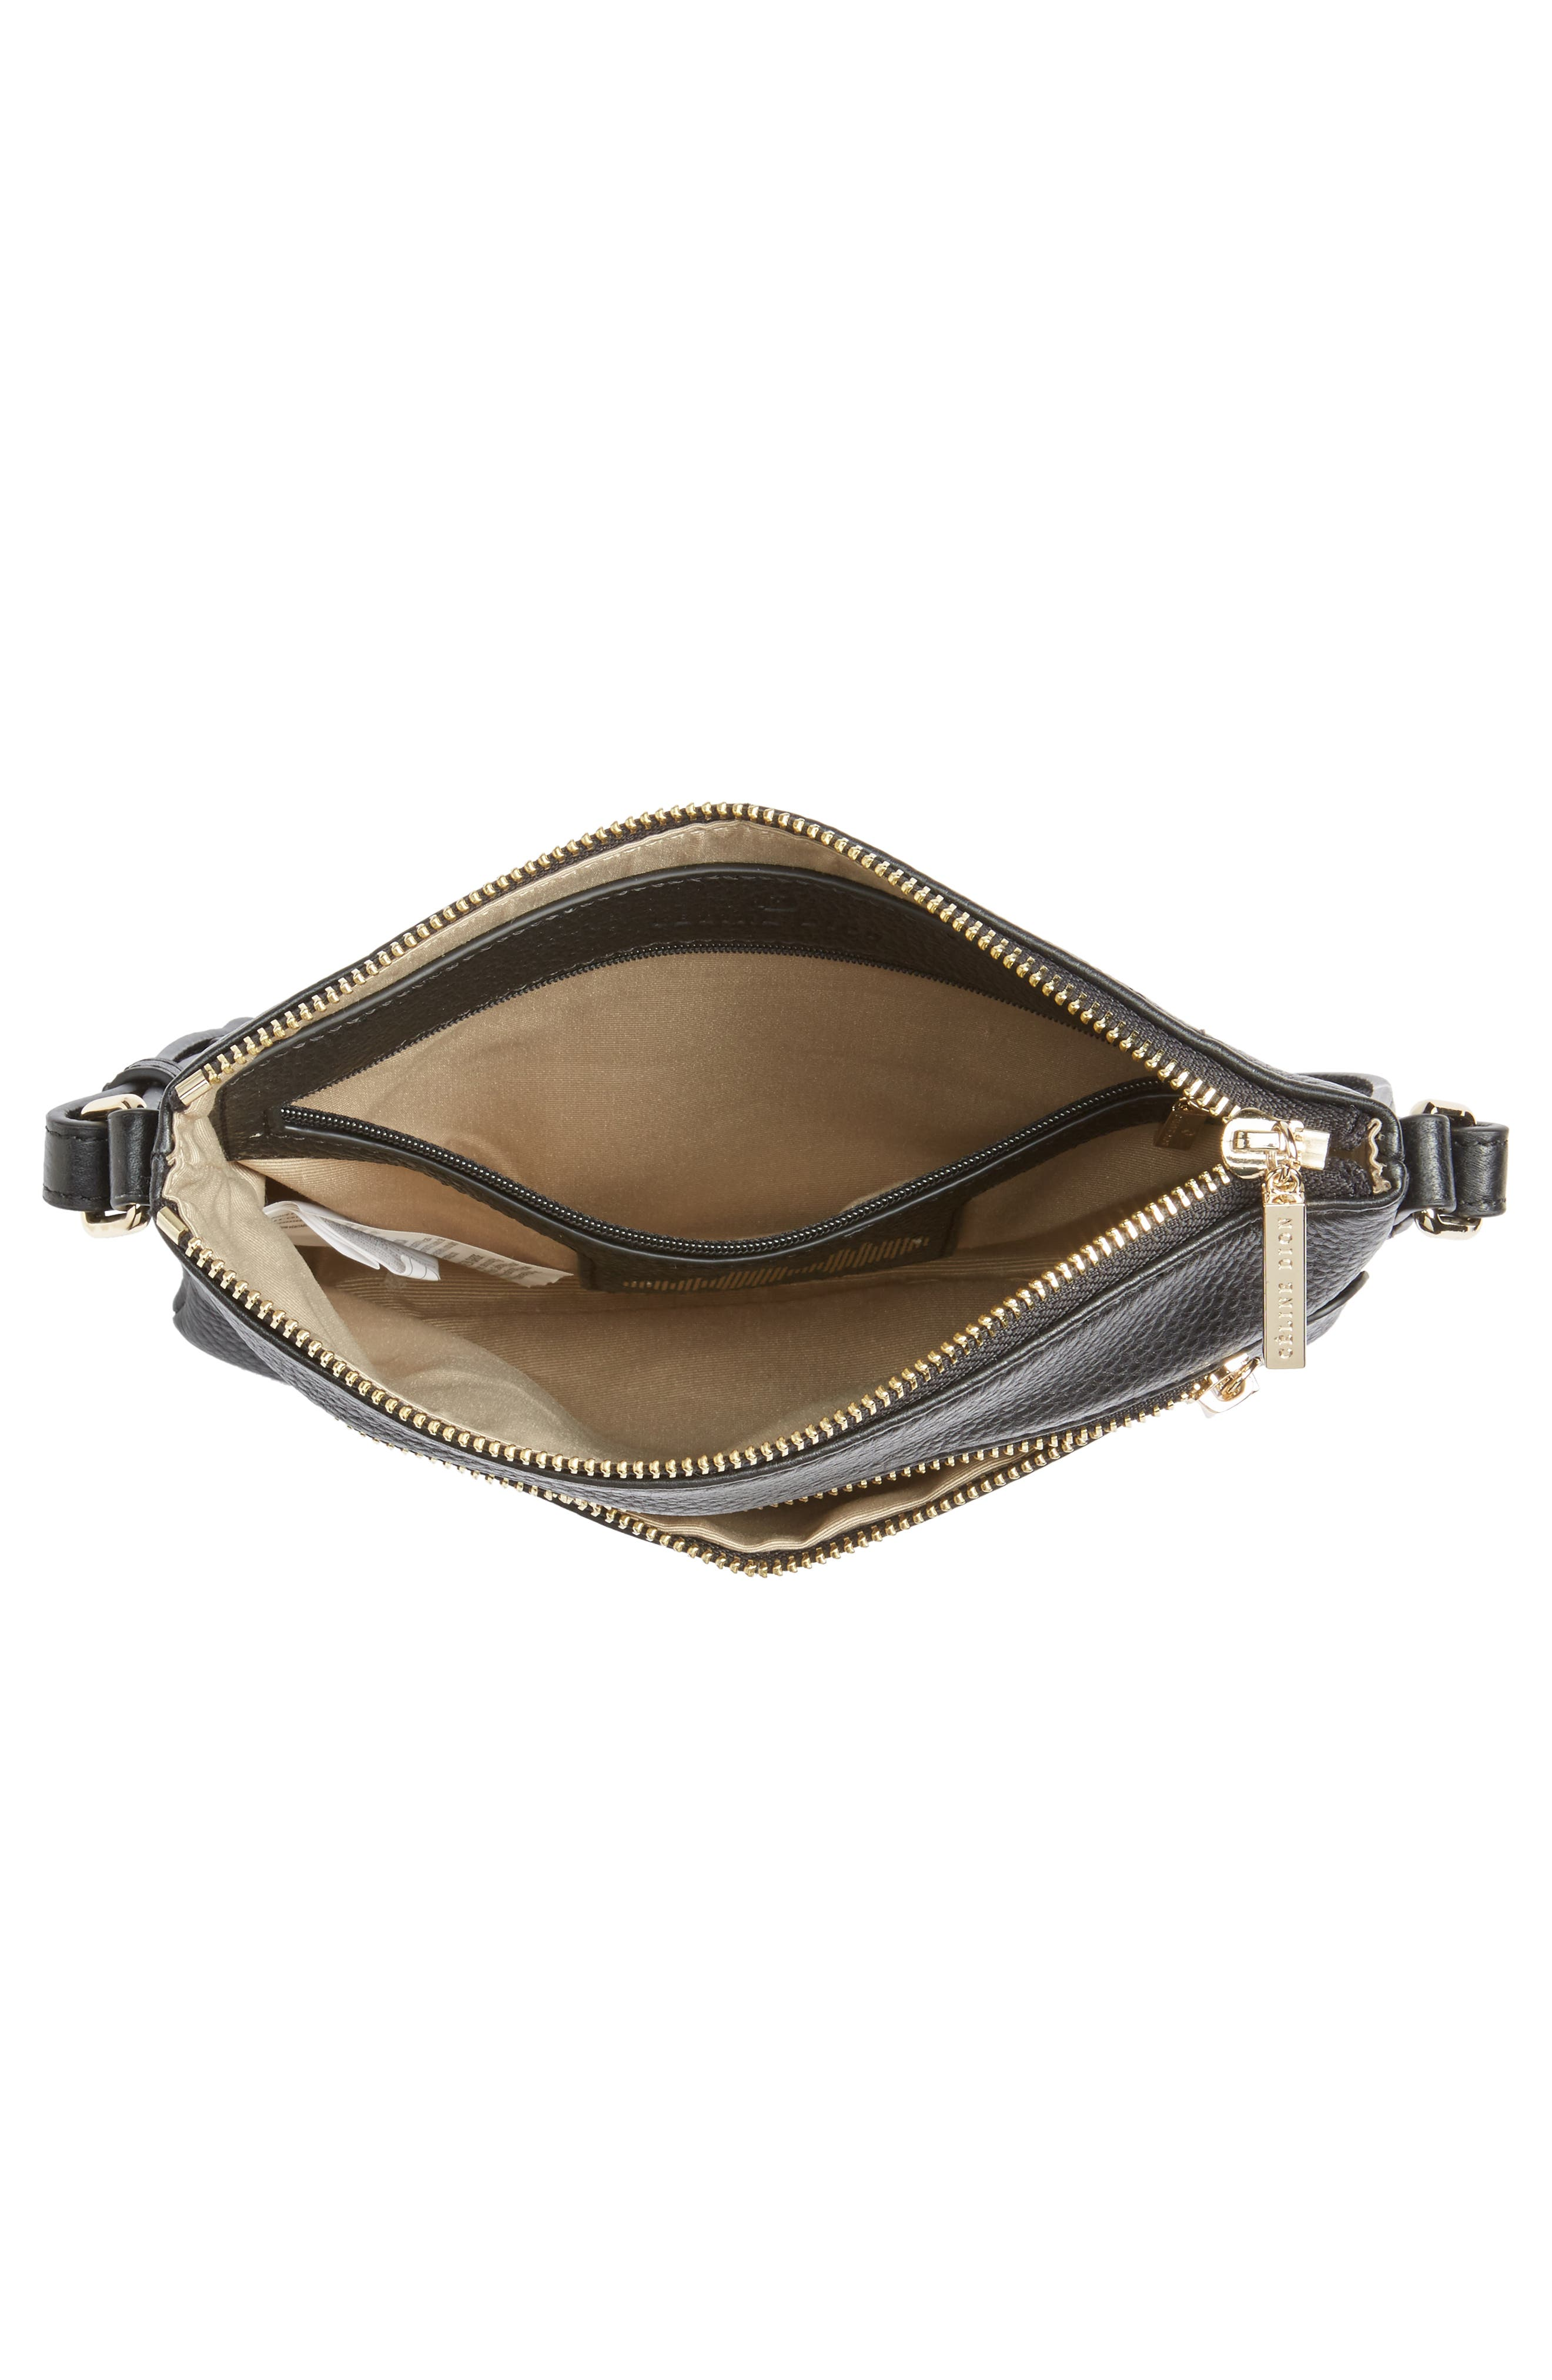 Céline Dion Adagio Leather Crossbody Bag,                             Alternate thumbnail 4, color,                             001